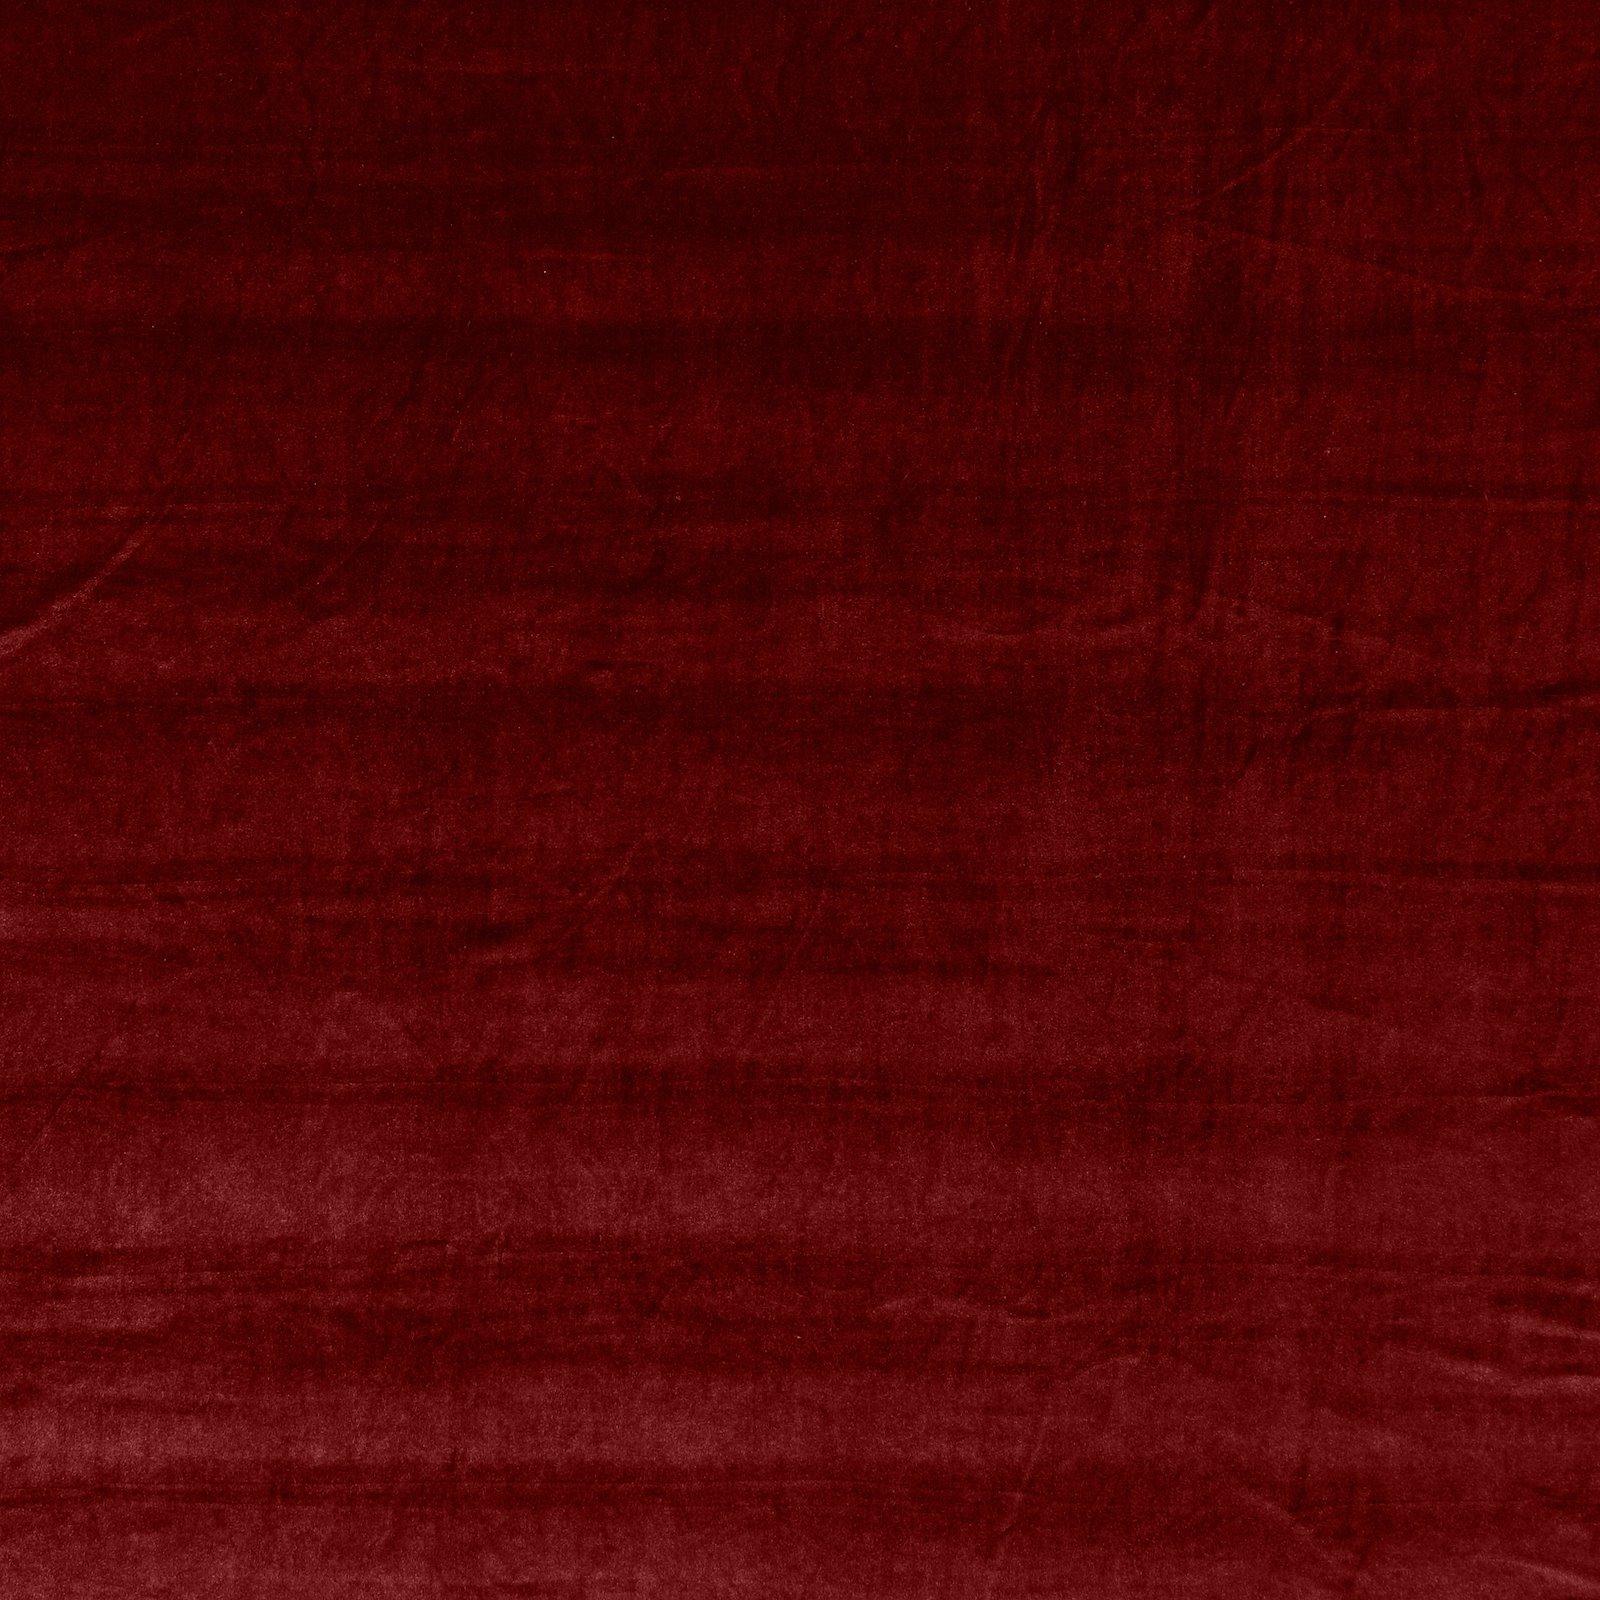 Shiny stretch velvet dark red 250690_pack_solid